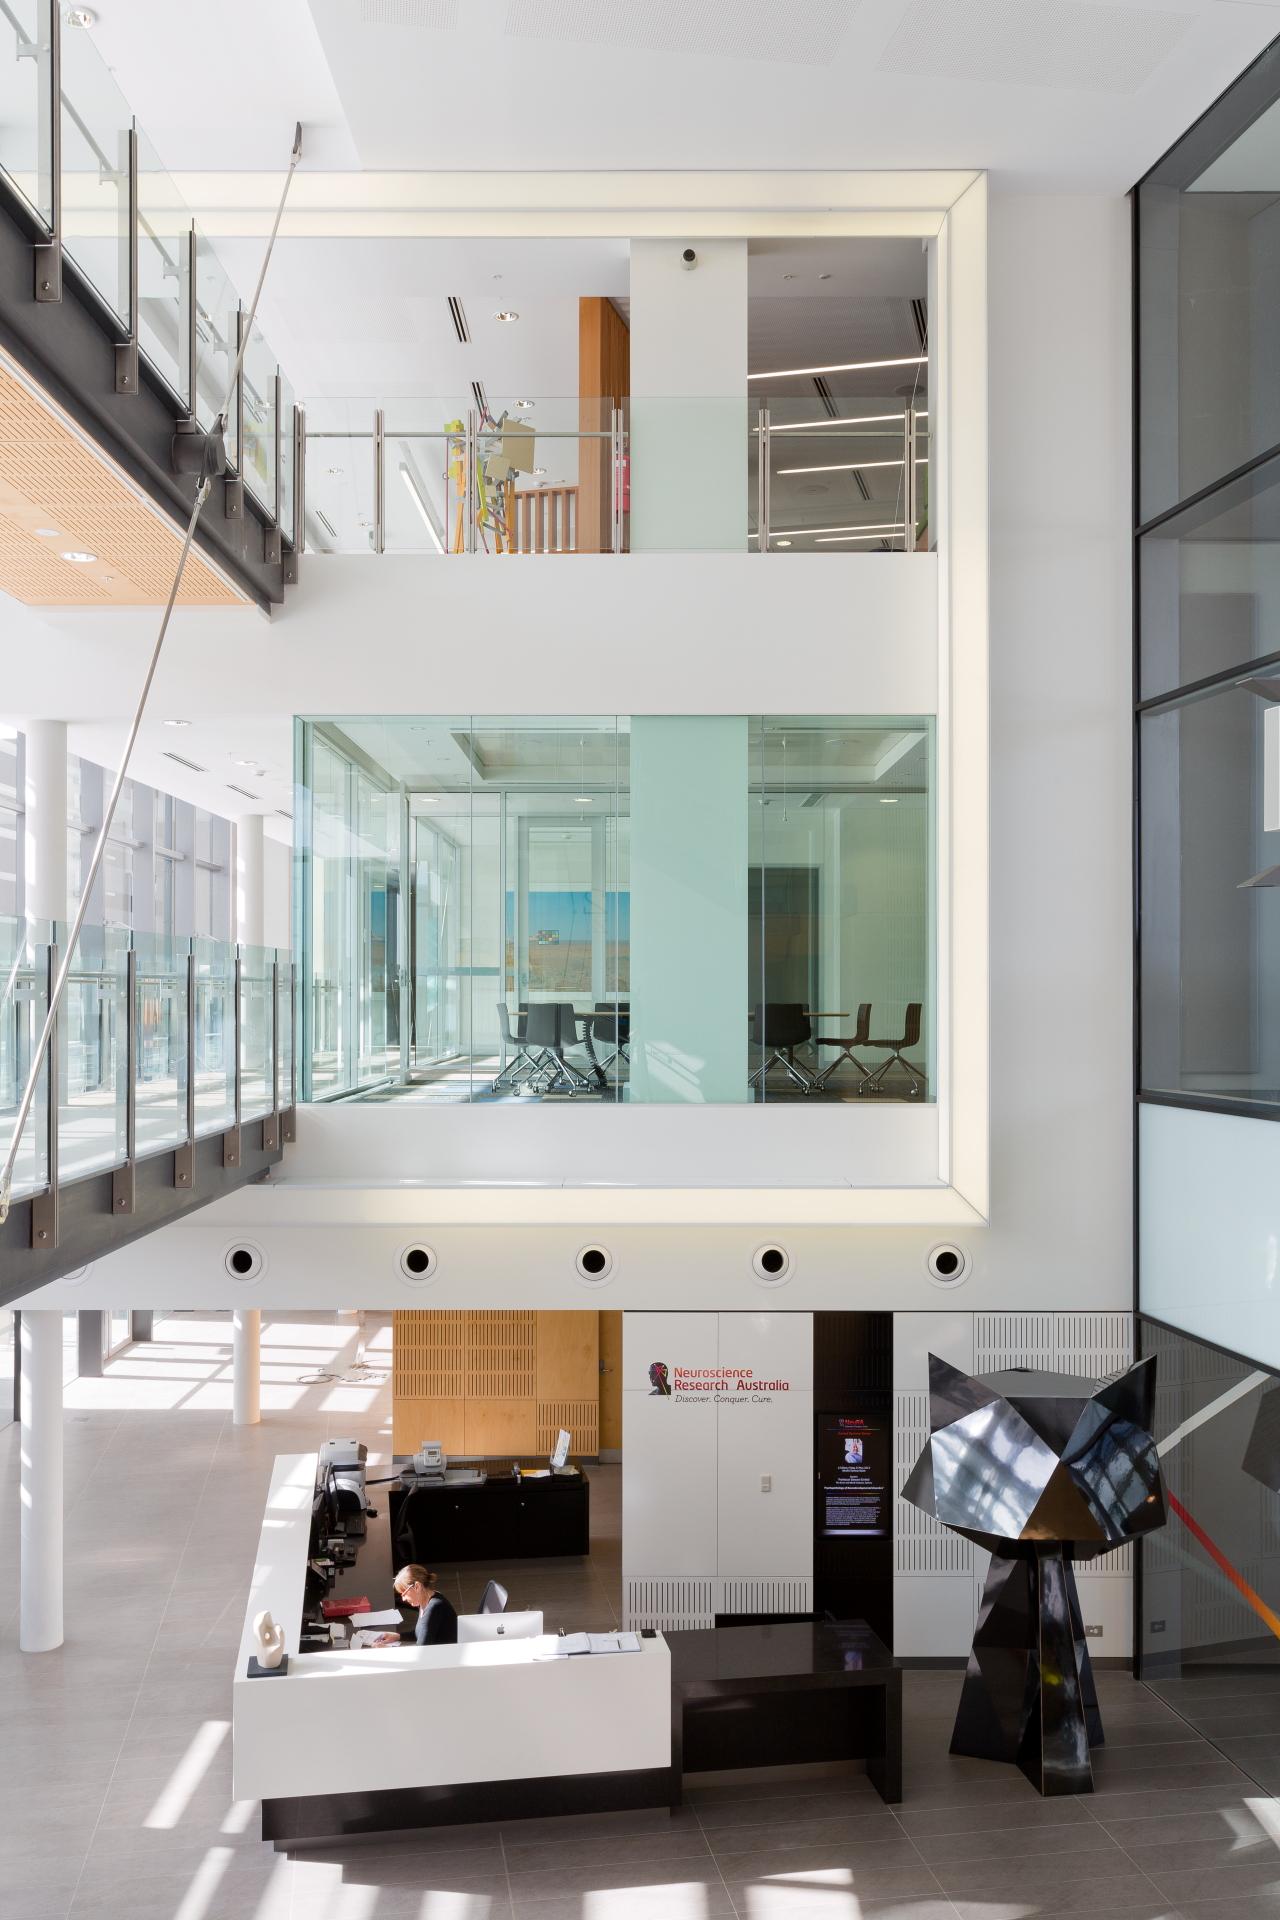 Neura Institute by Cox Richardson